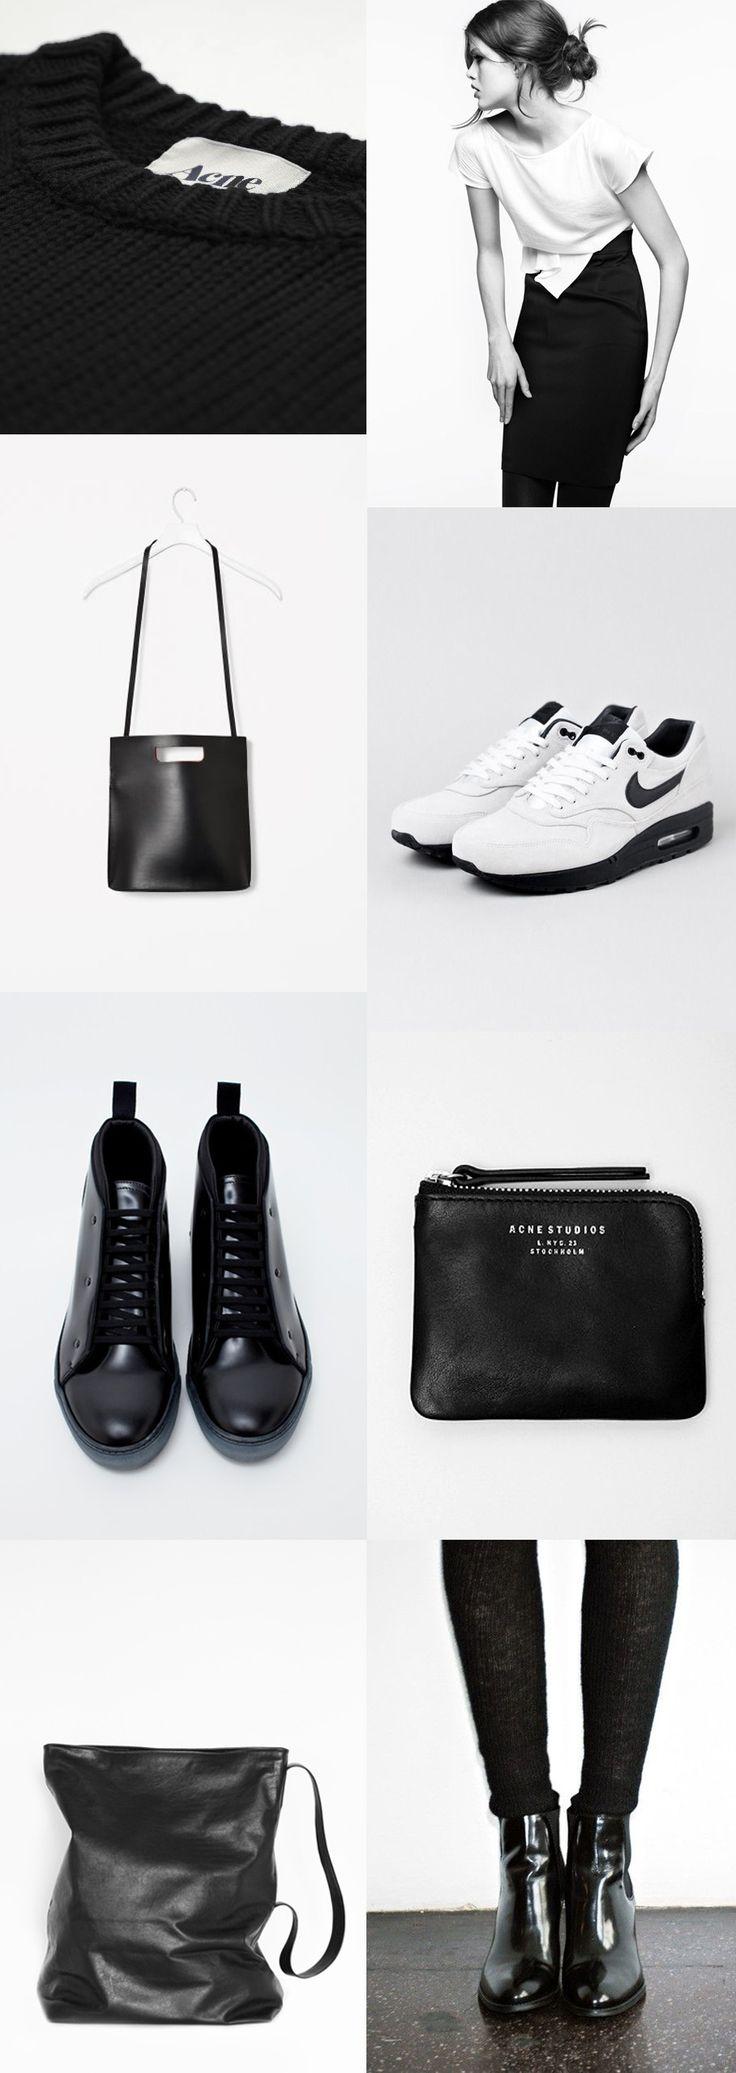 Black & white style // alostplace.com : Minimal + Classic   Nordhaven Studio